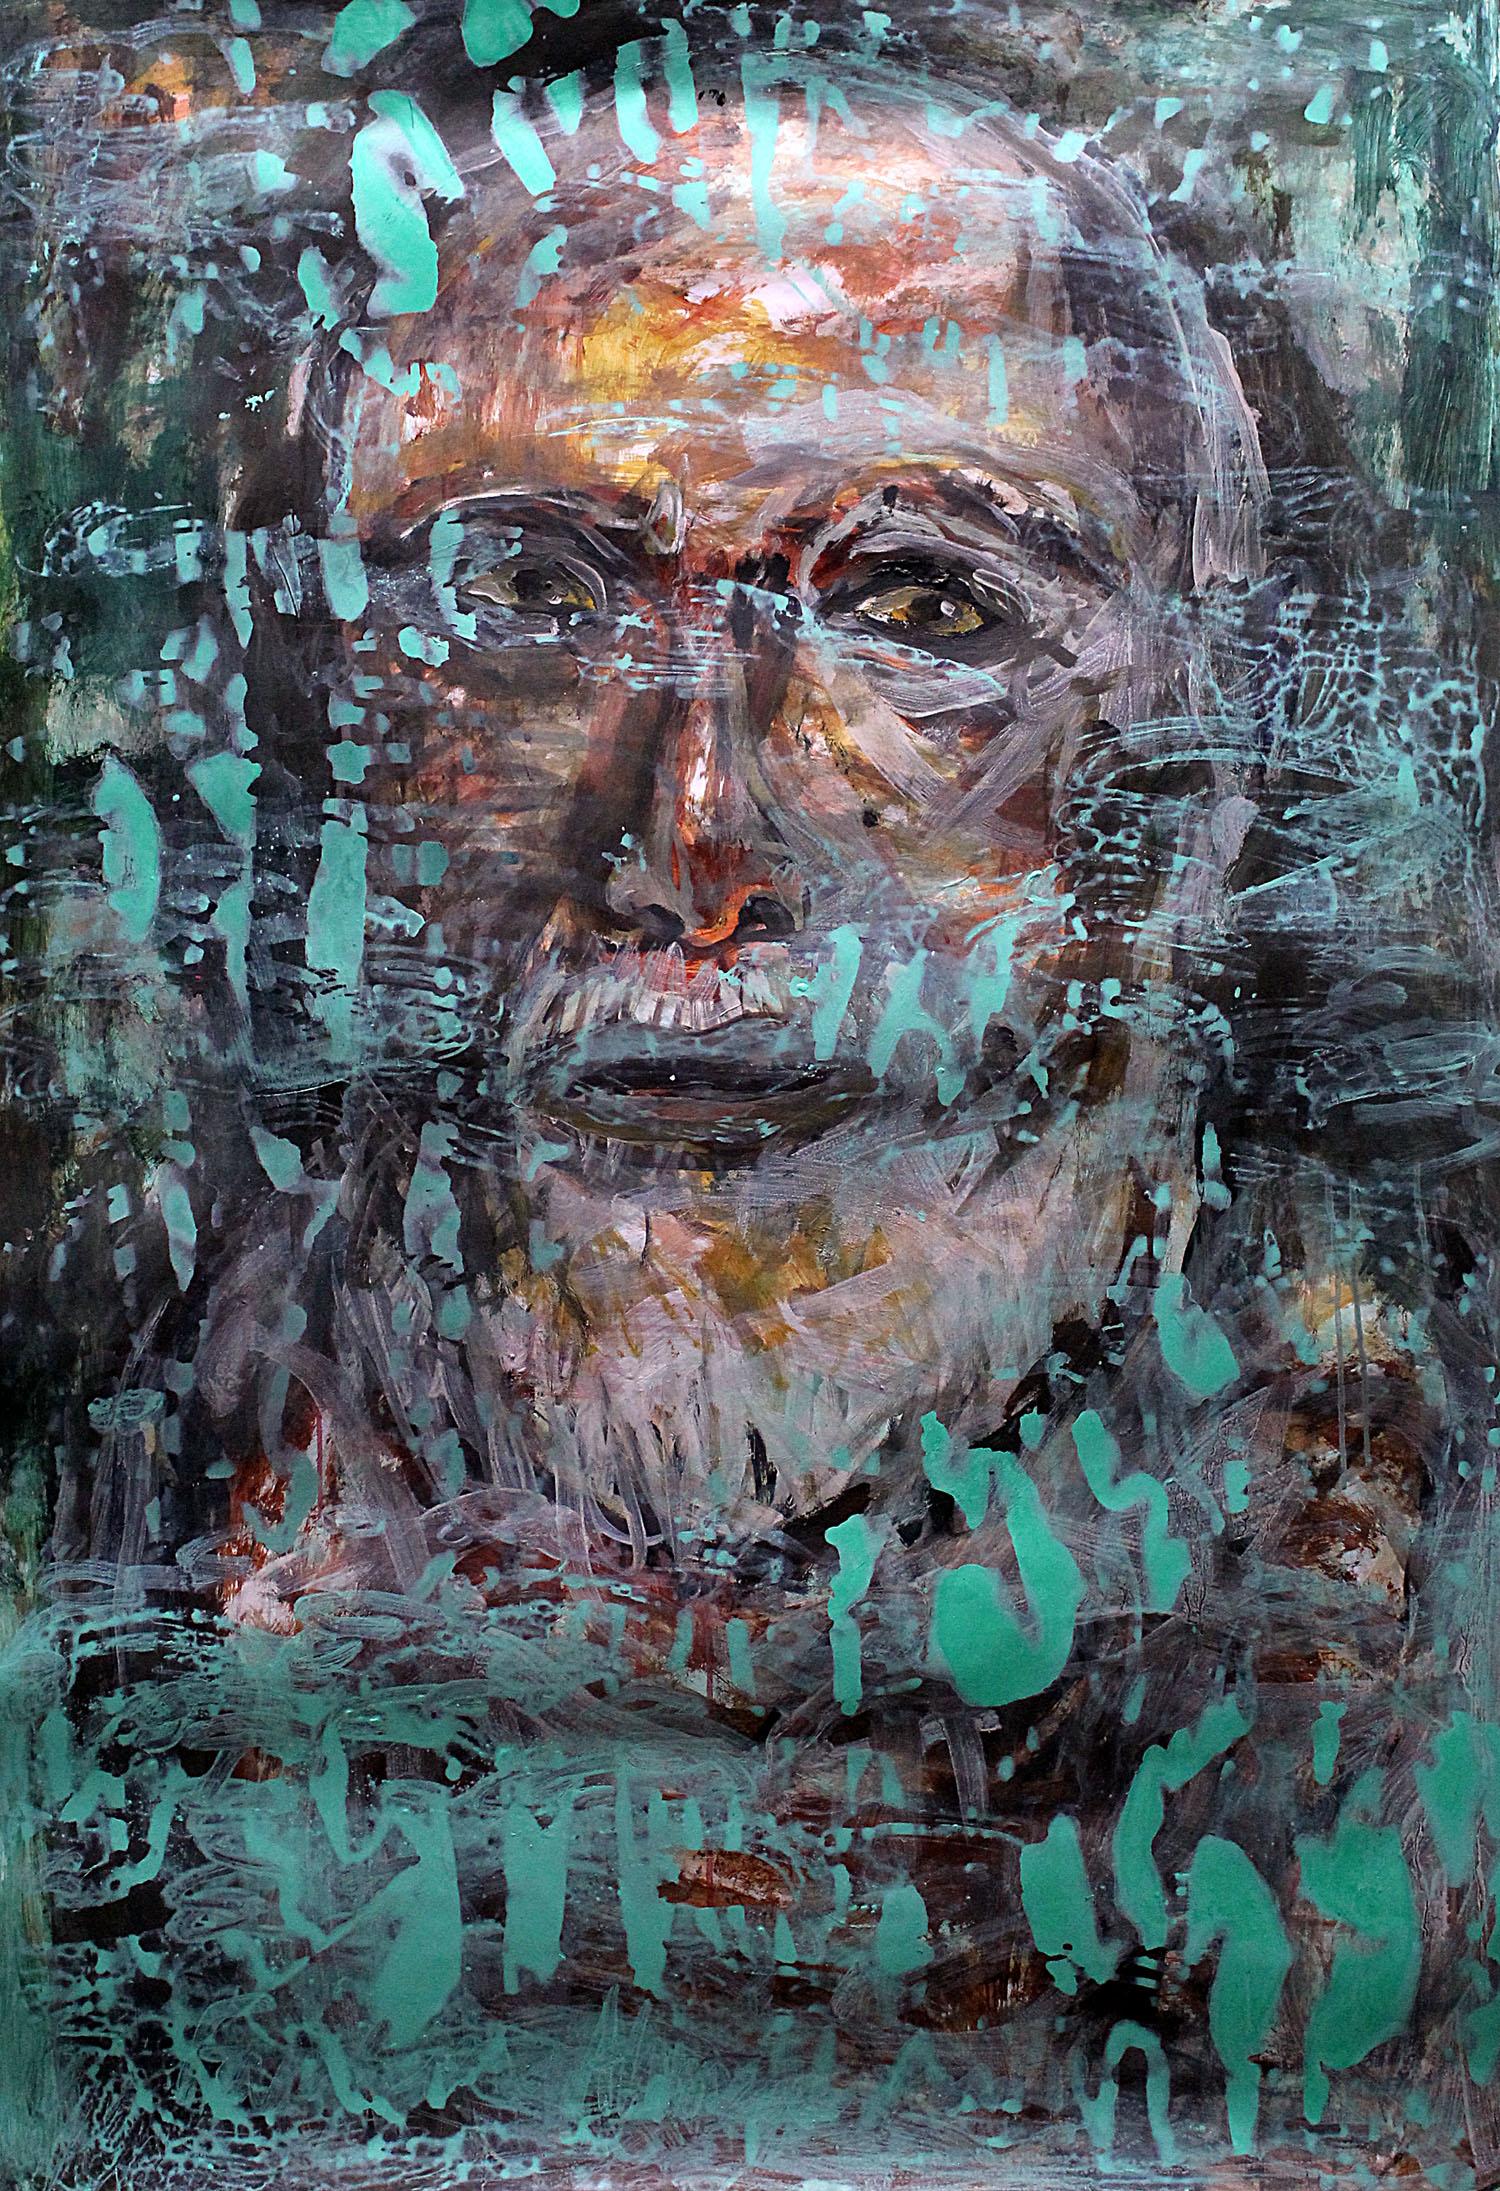 Farzana Ahmed Urmi,  Known Unknown 9 , 2014. Courtesy of the artist and the Samdani Art Foundation